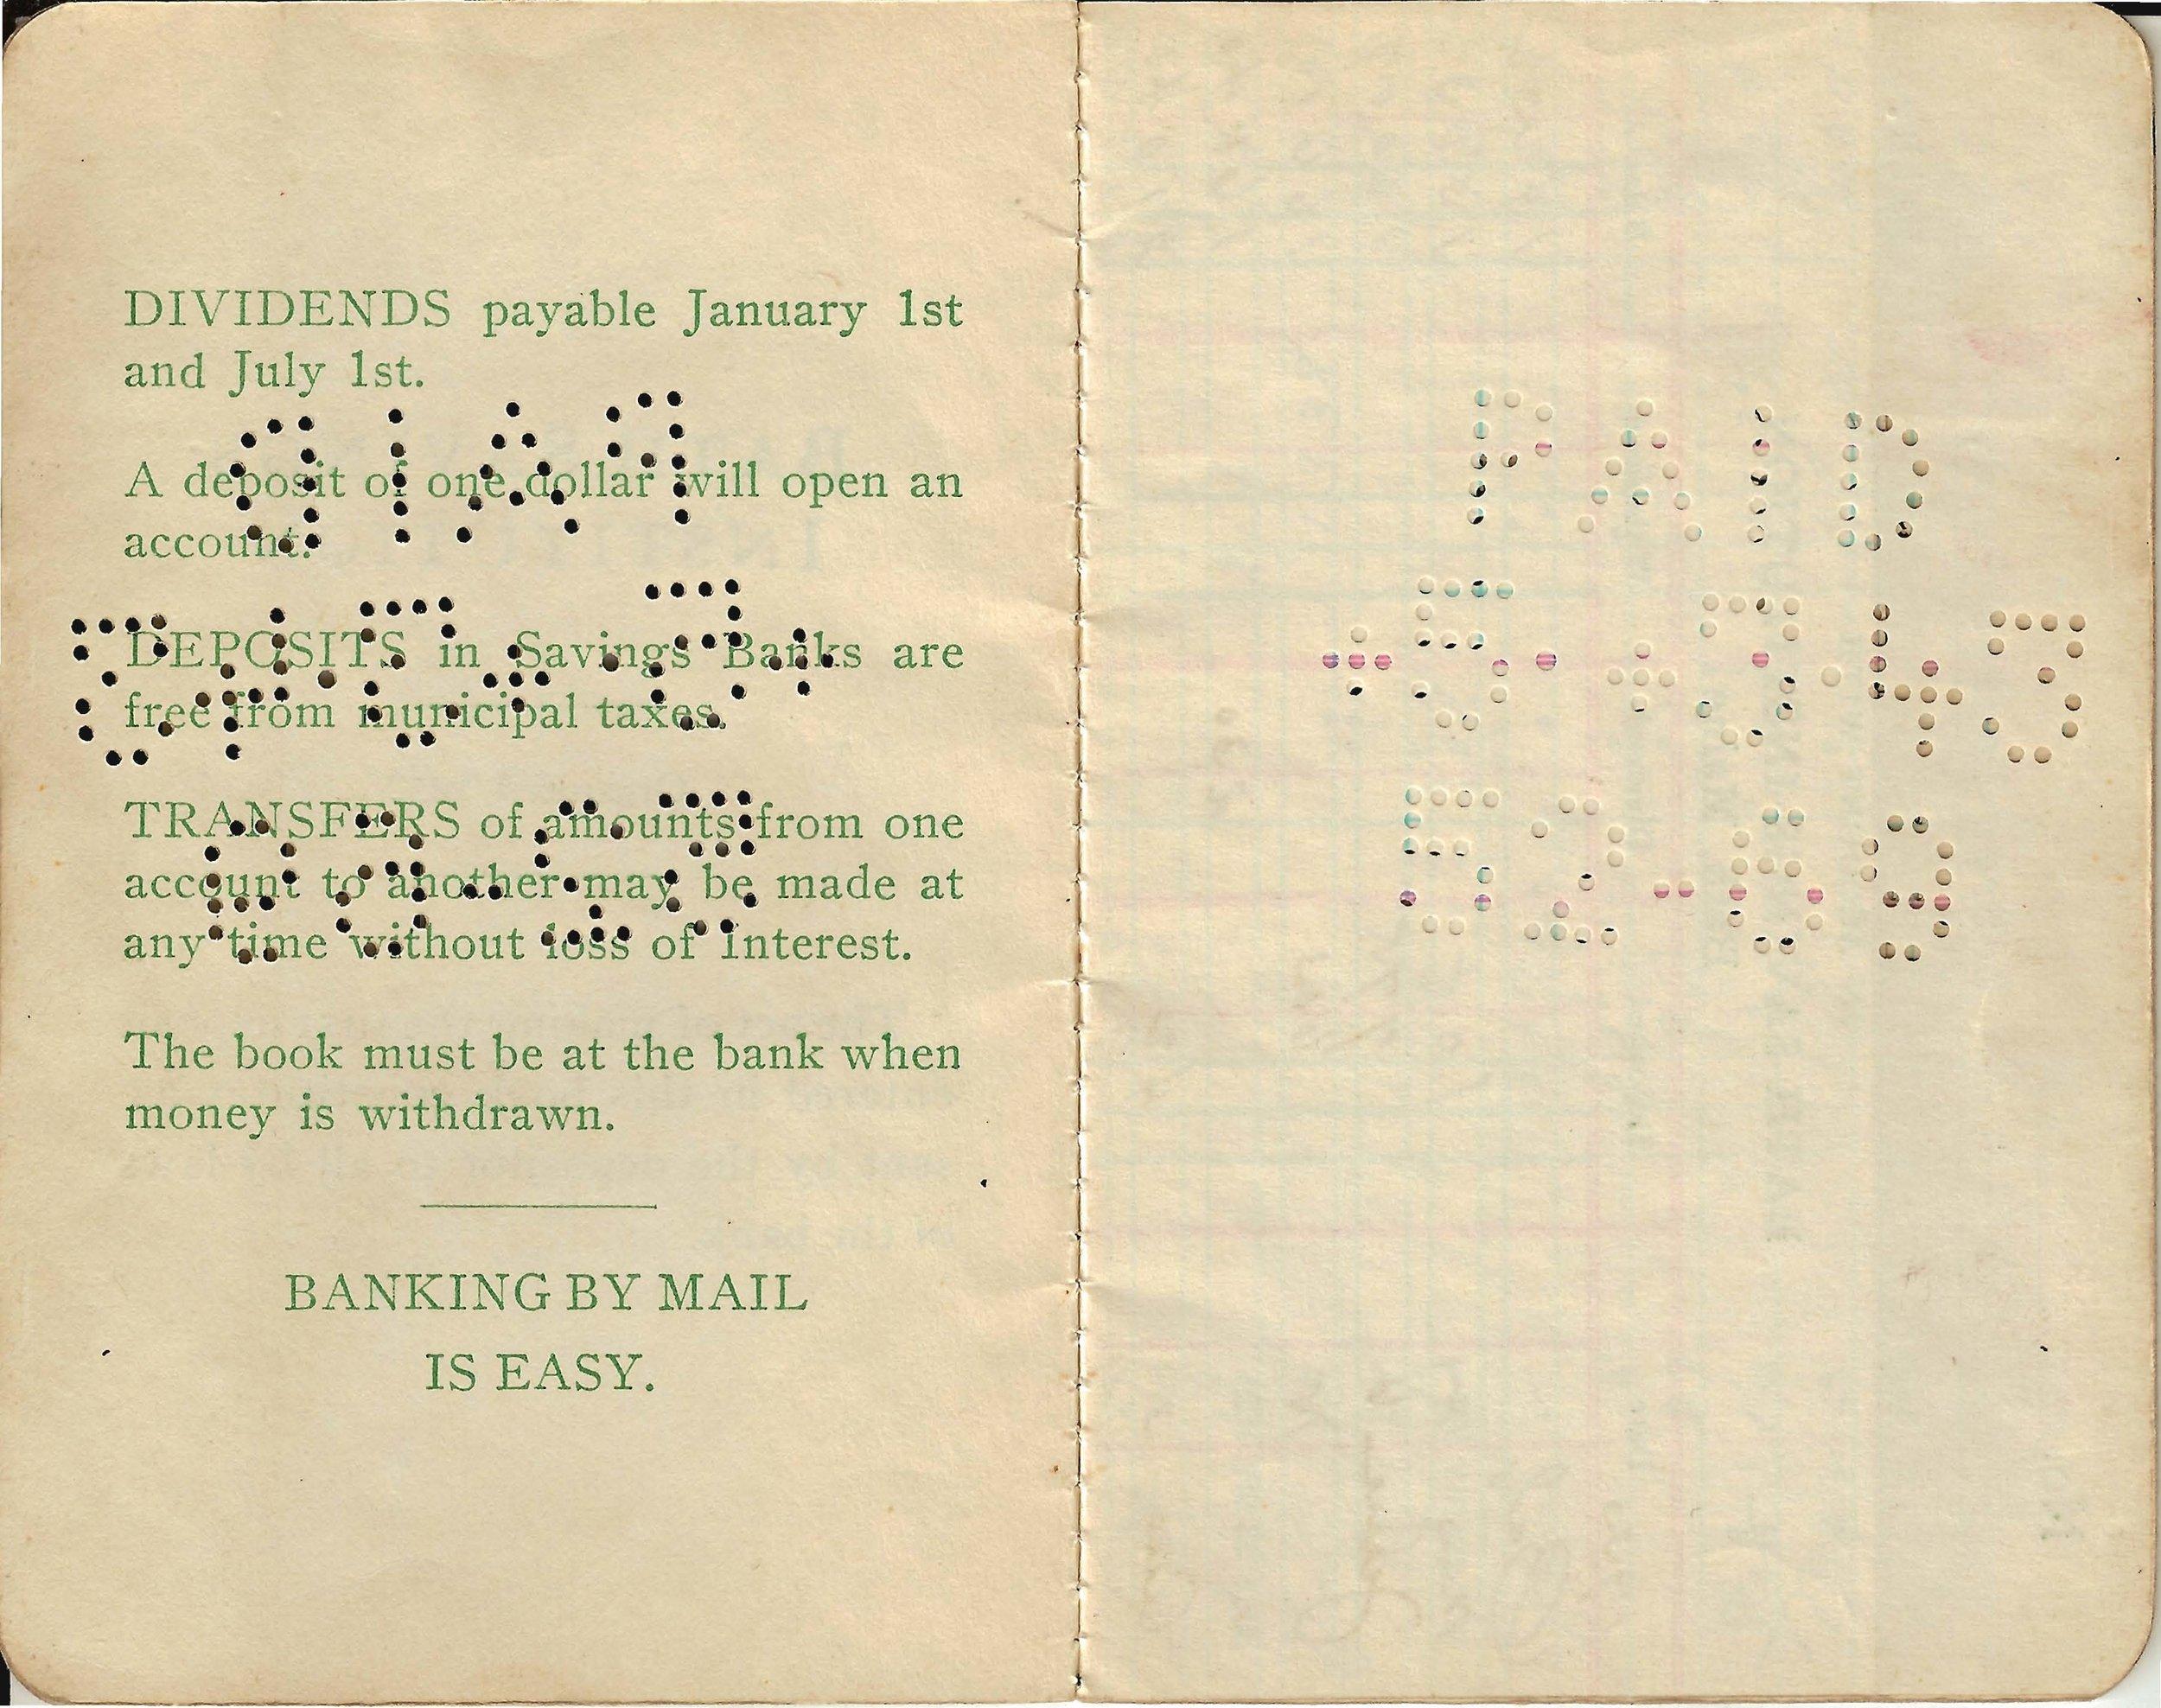 Bath Savings Institution (1933-42)_Page_03.jpg